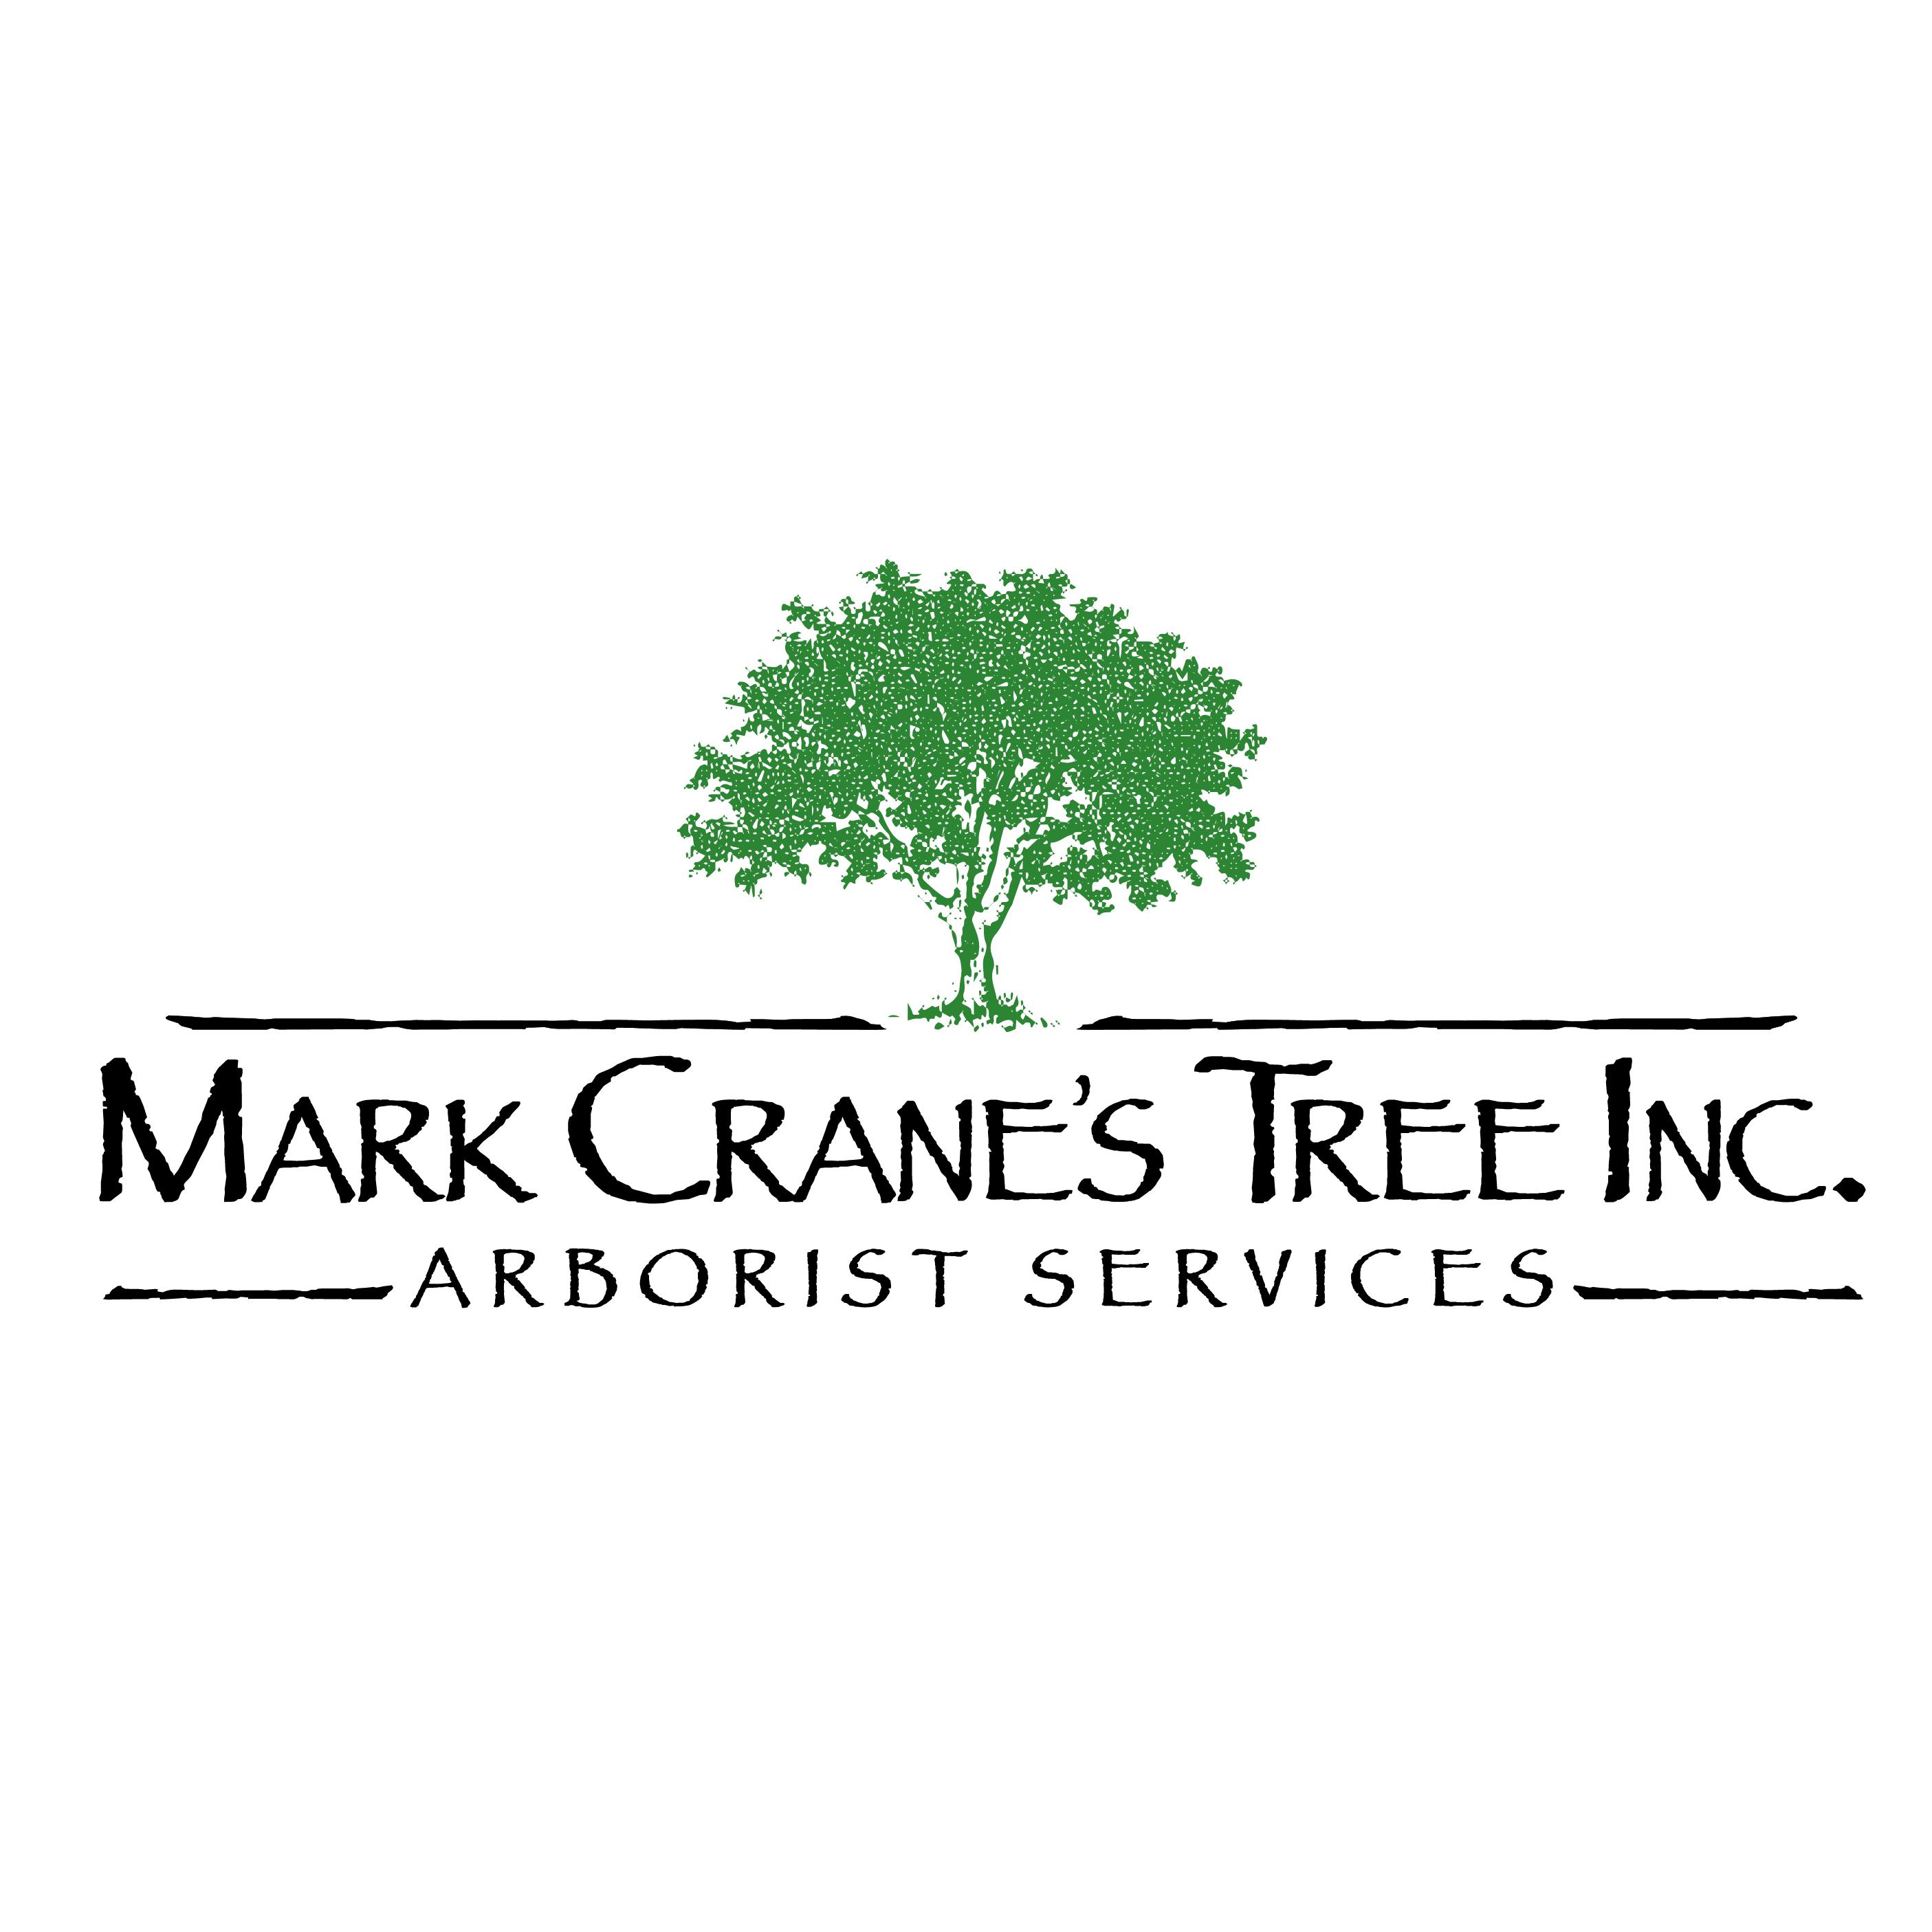 Mark Crane's Tree & Arborist Services